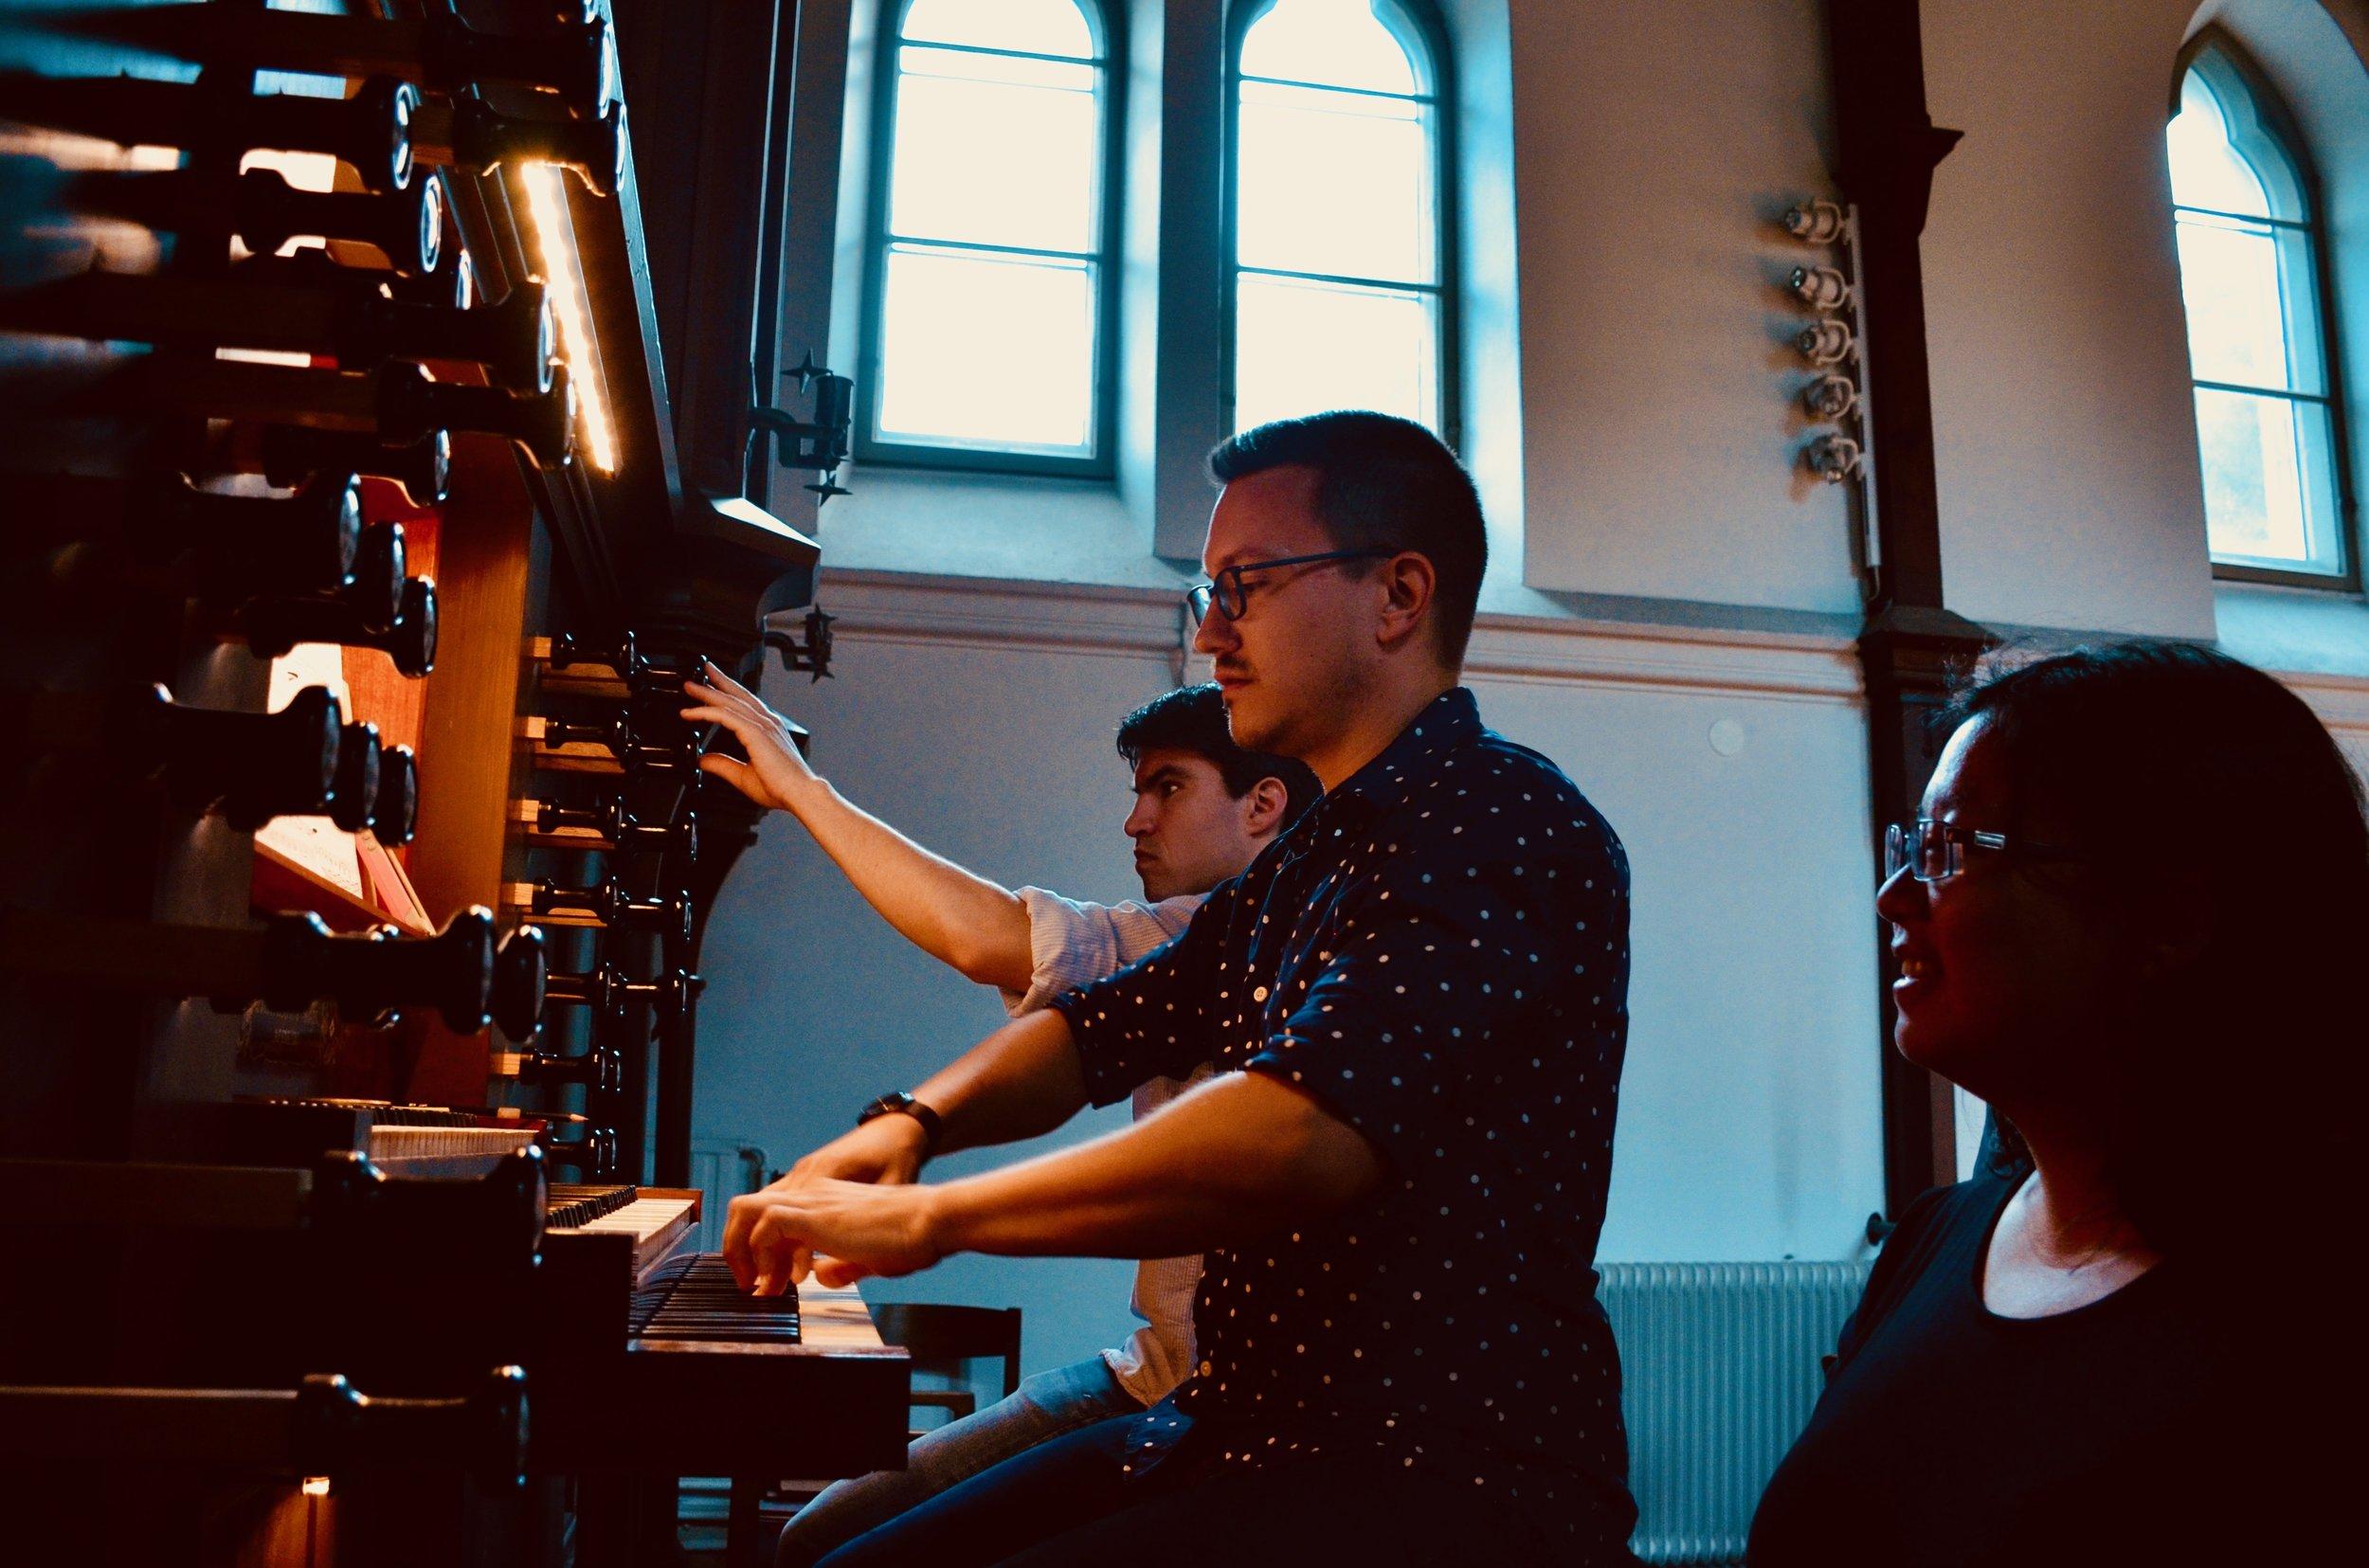 Corey De Tar plays the 1861 Marcussen & Søn organ in Haga Church, Göteborg, Sweden.